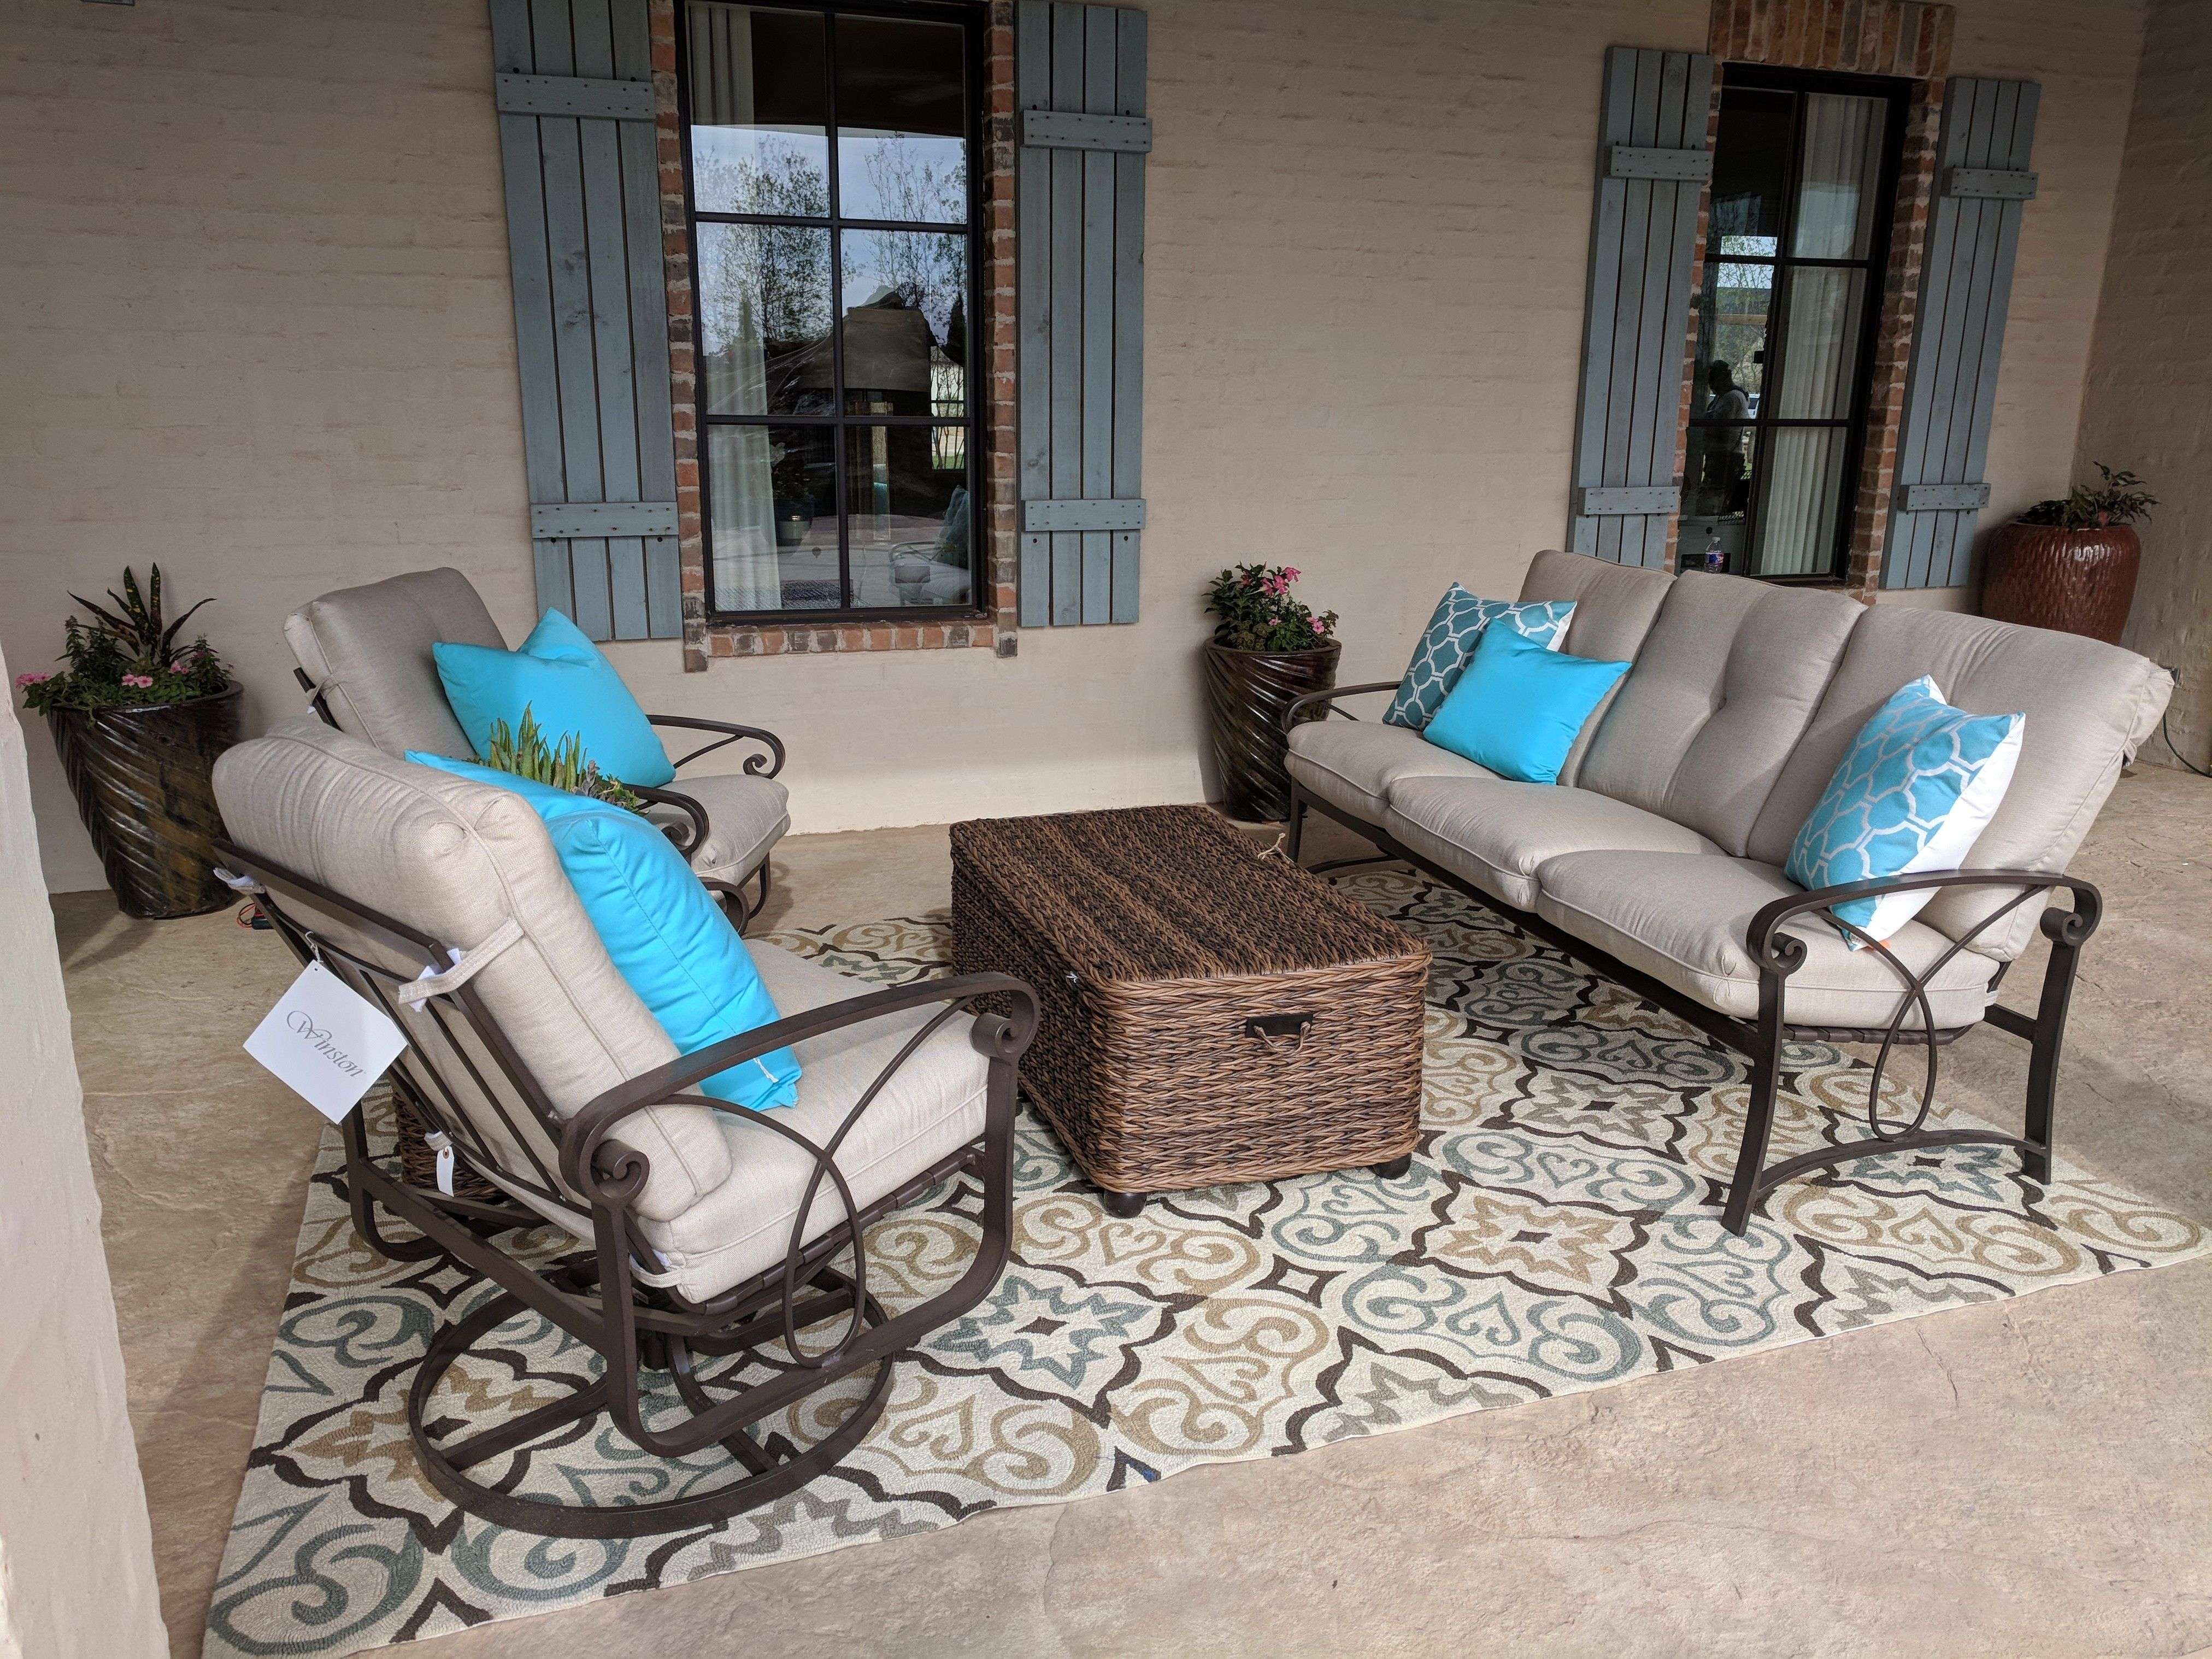 winston palazzo outdoor furniture